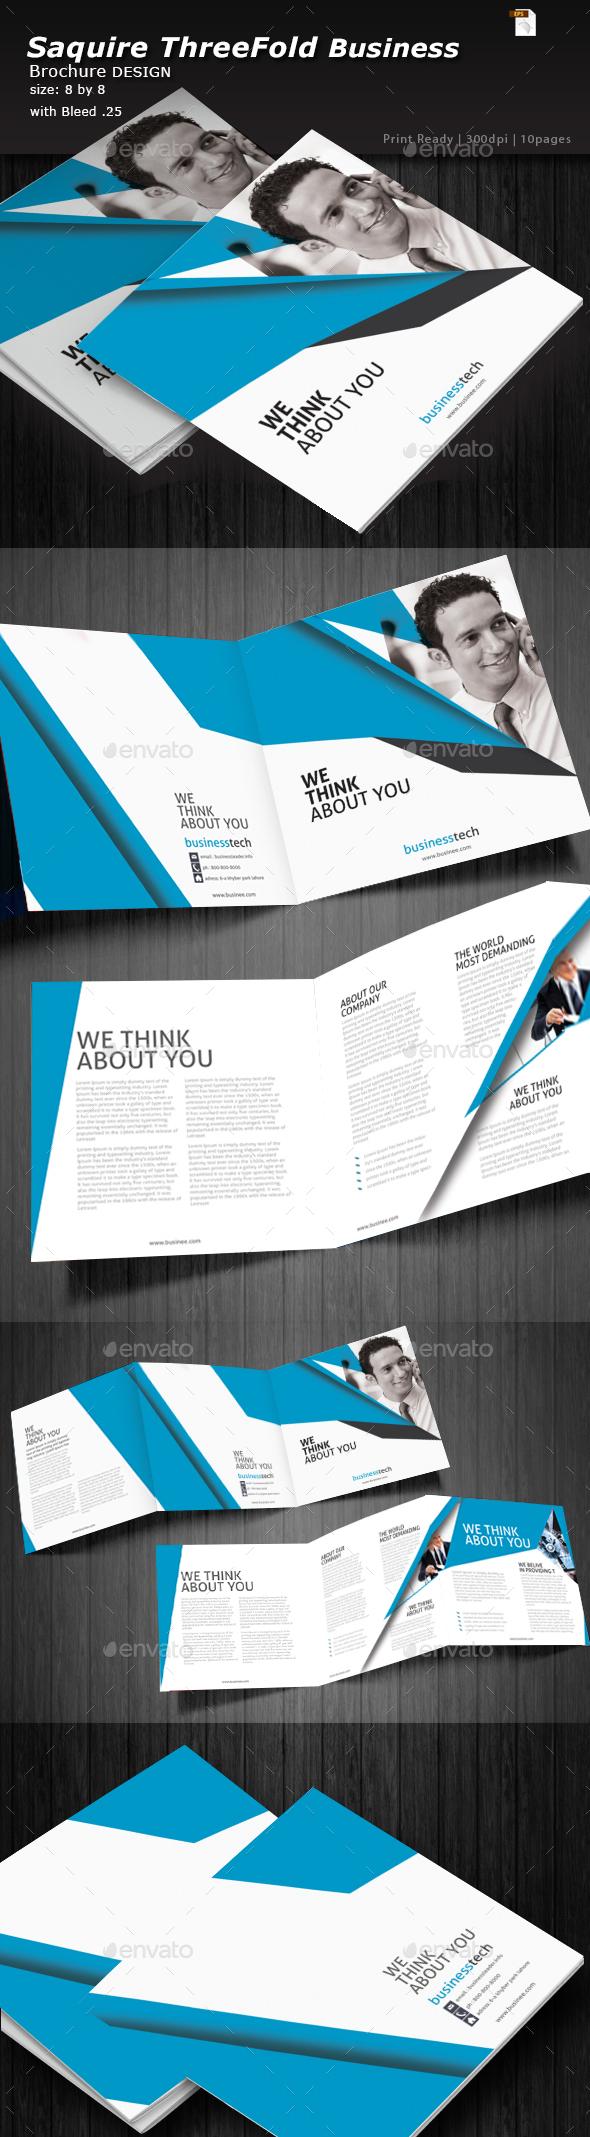 Square Business Three Fold Brochure  - Brochures Print Templates